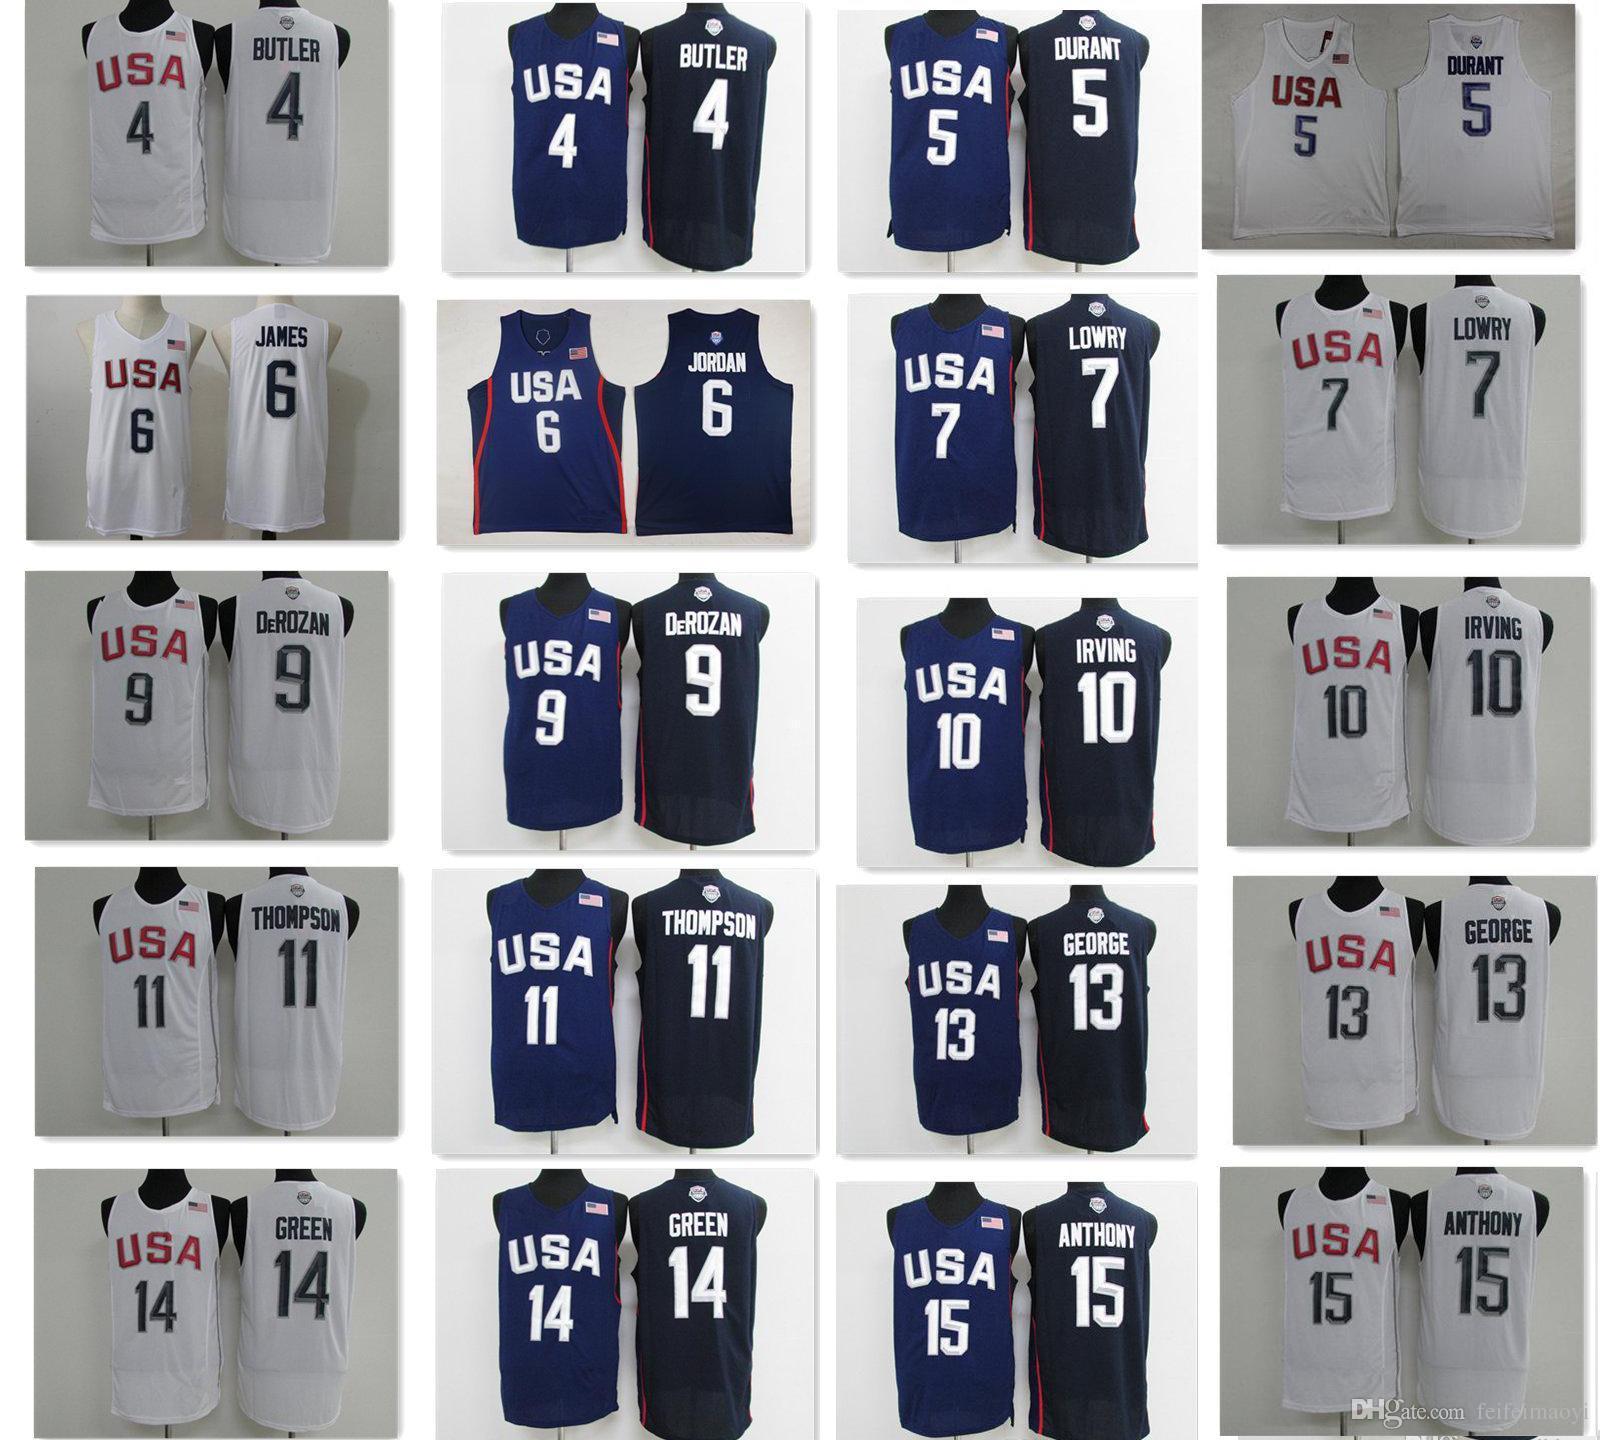 362150a90 ... revolution 30 swingman basketball jersey b2bca 76c69  promo code for  2018 2016 dream team twelve 7 kyle lowry 5 kevin durant usa jersey